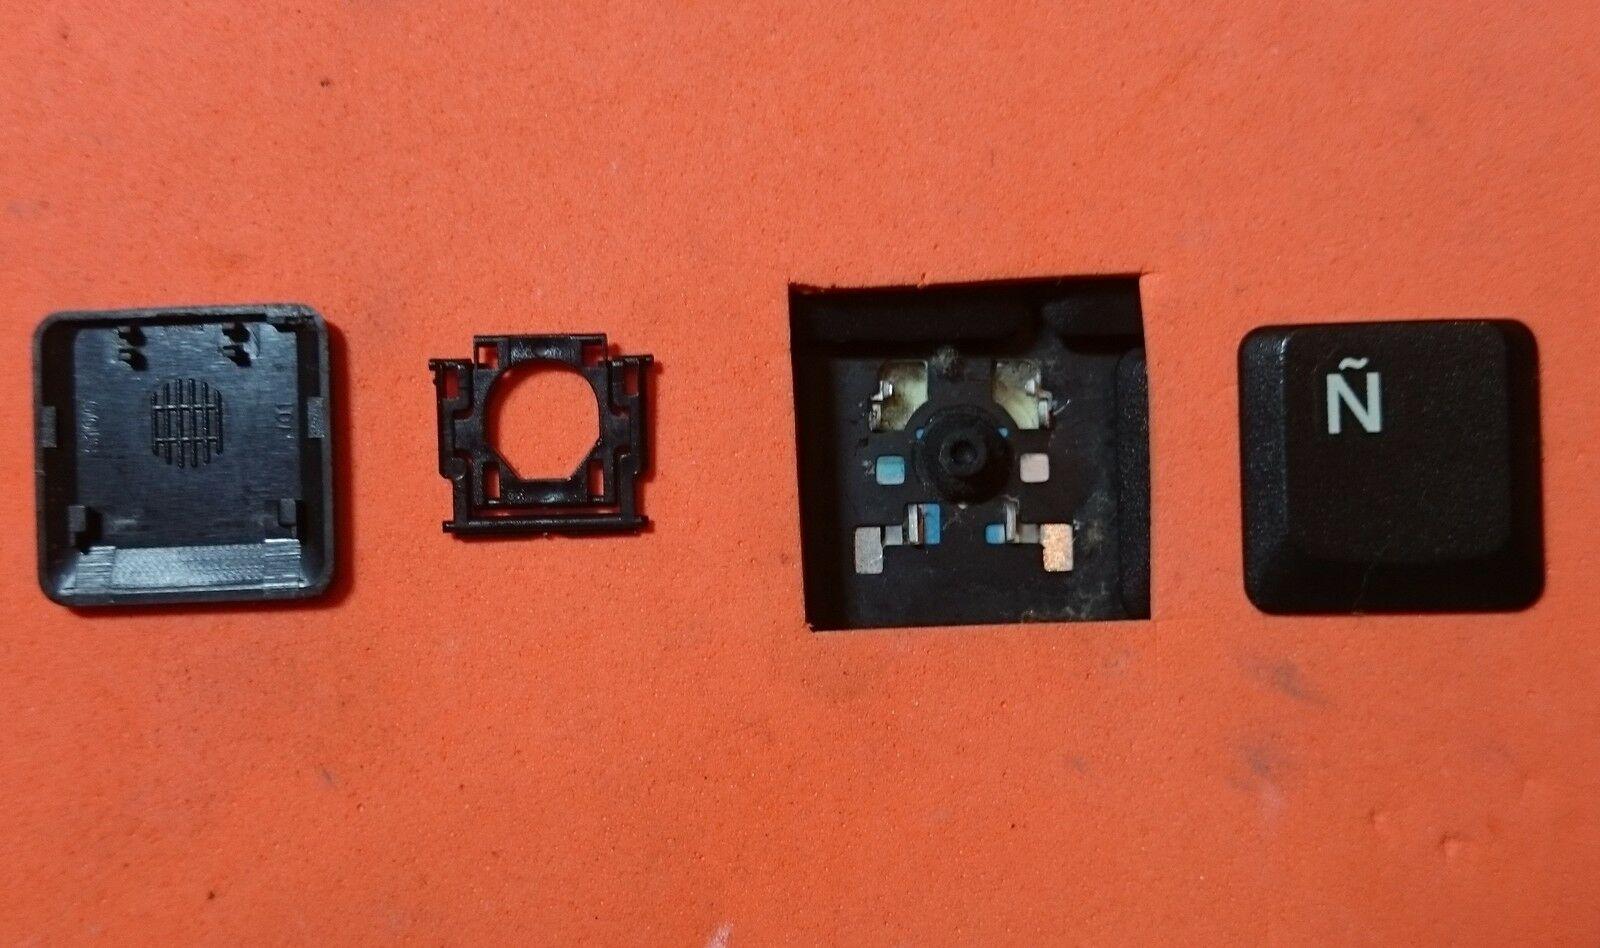 TECLA TECLAS DE TECLADO PACKARD BELL EASYNOTE ALP AJAX MX35 MX37 MX45 MX51 MX52